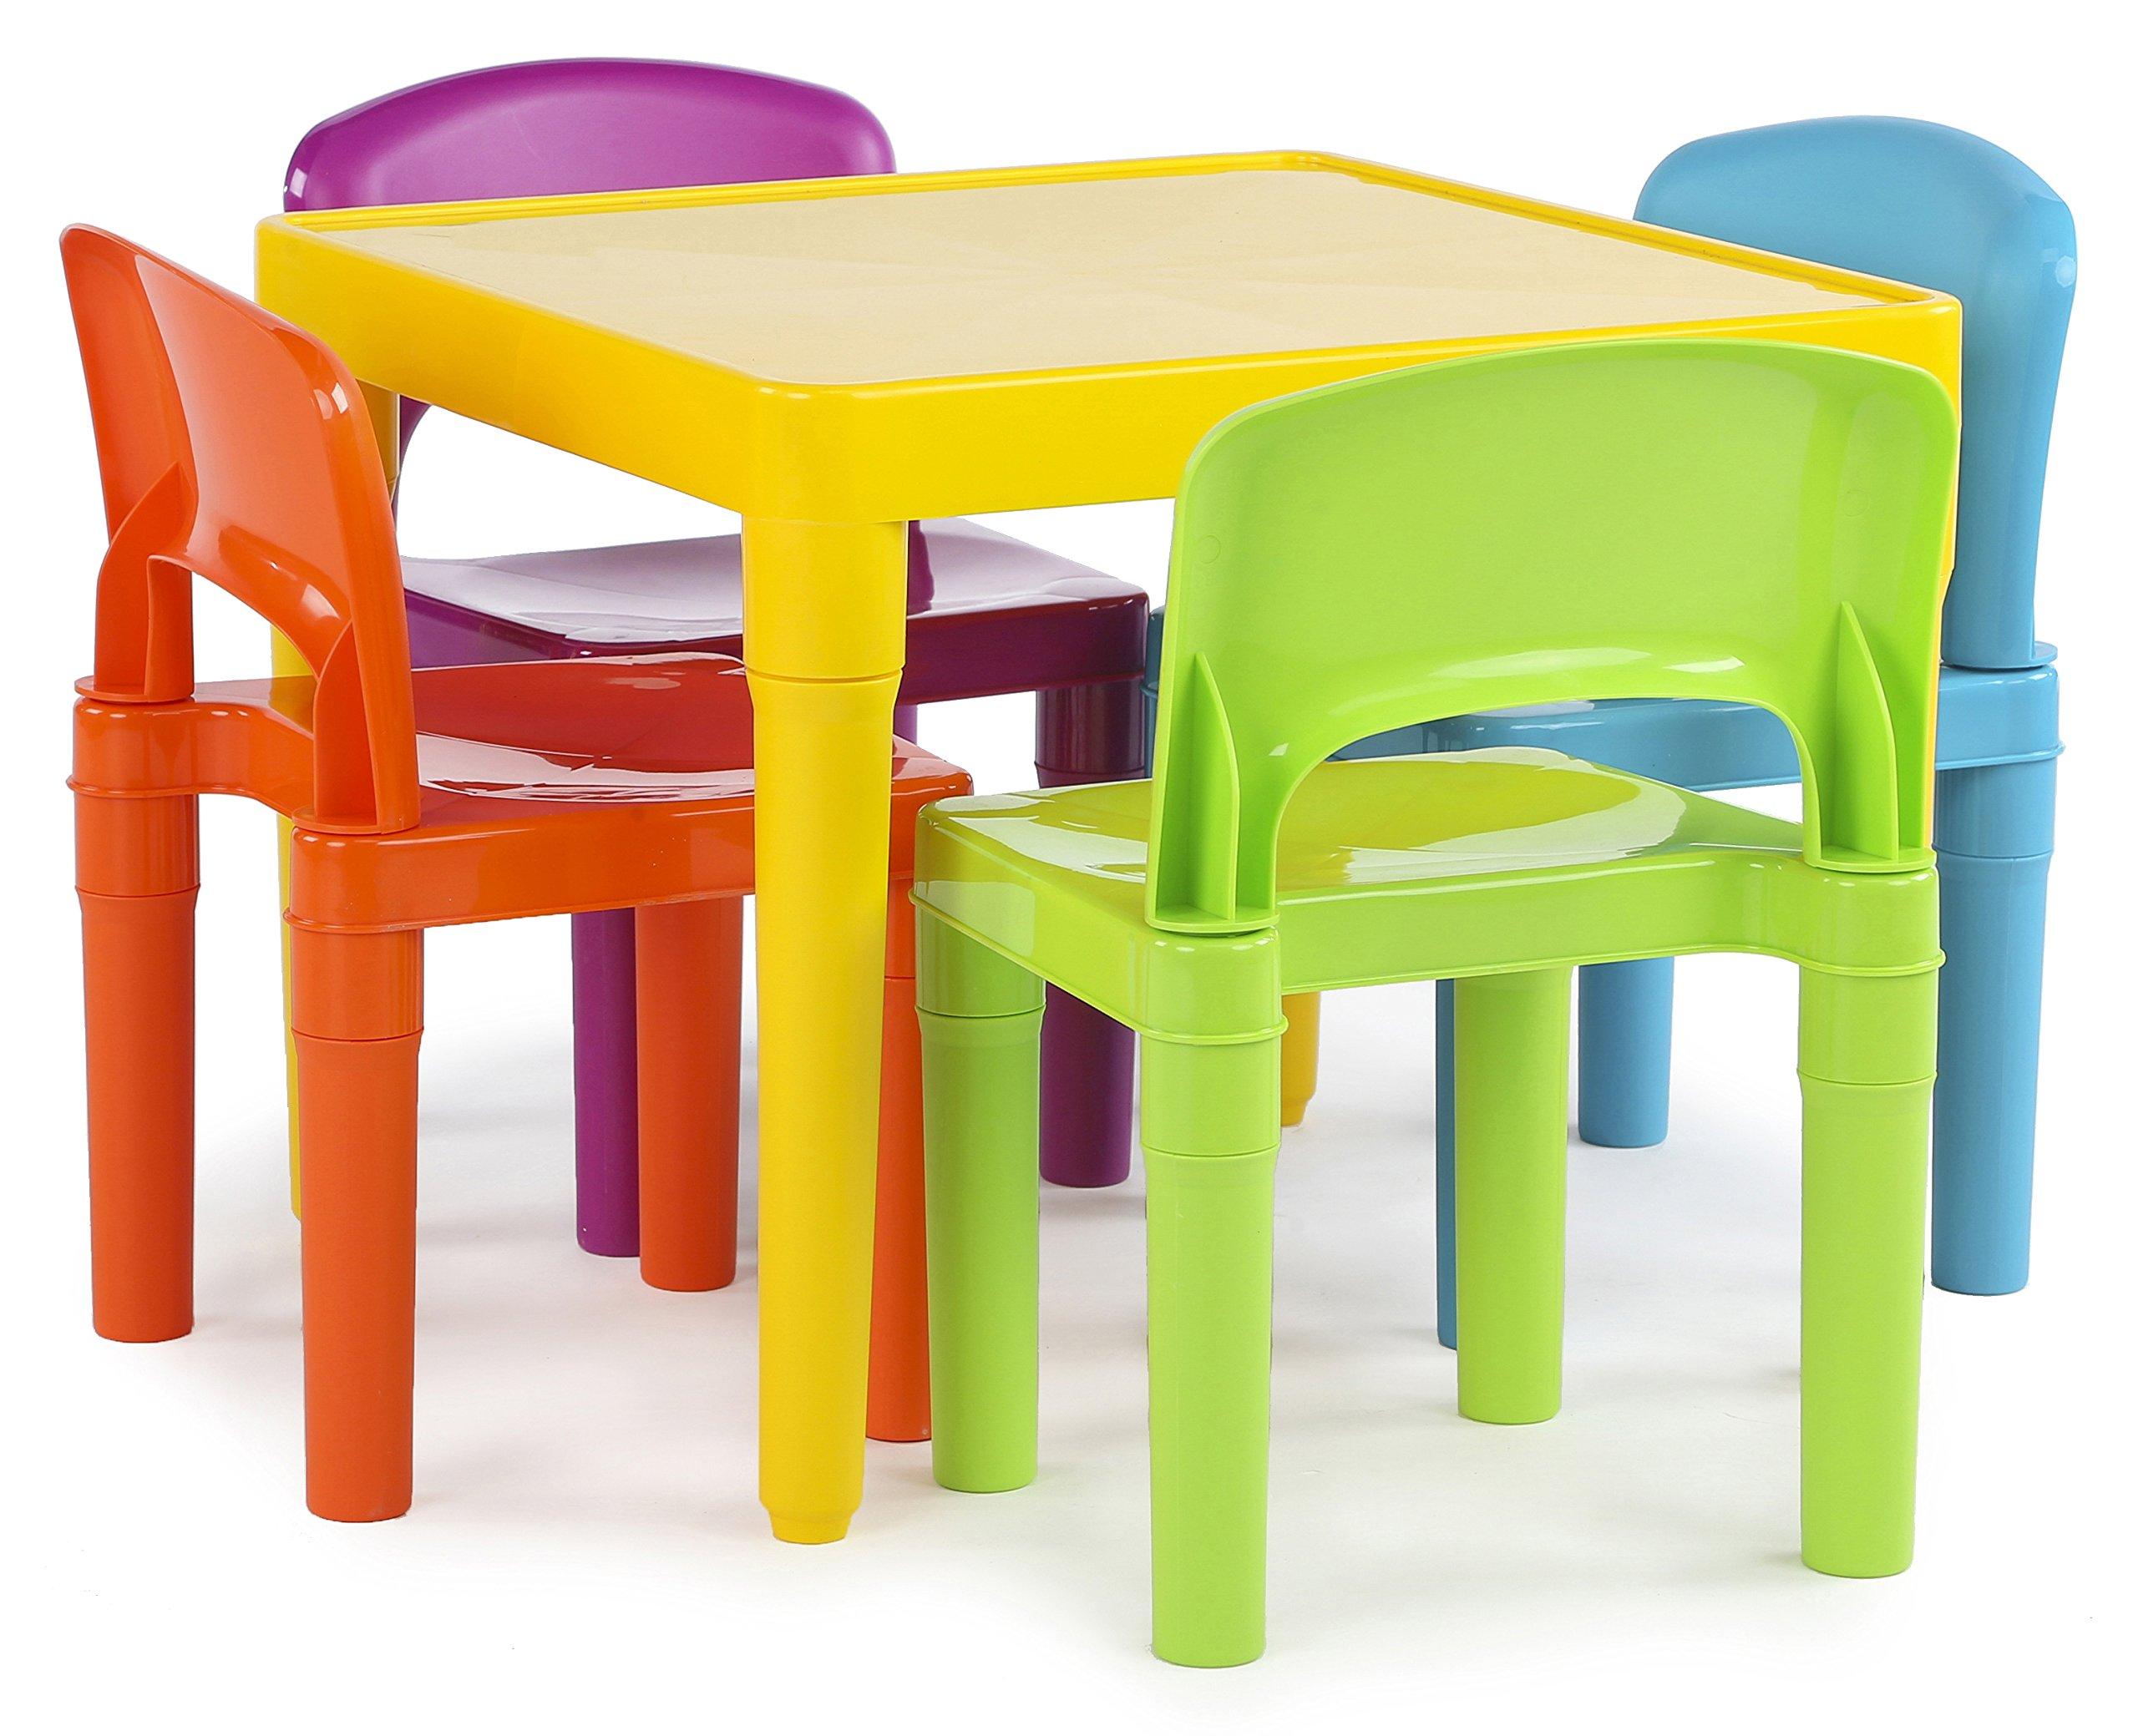 Tot Tutors Kids Plastic Table and 4 Chairs Set, Vibrant Colors by Tot Tutors